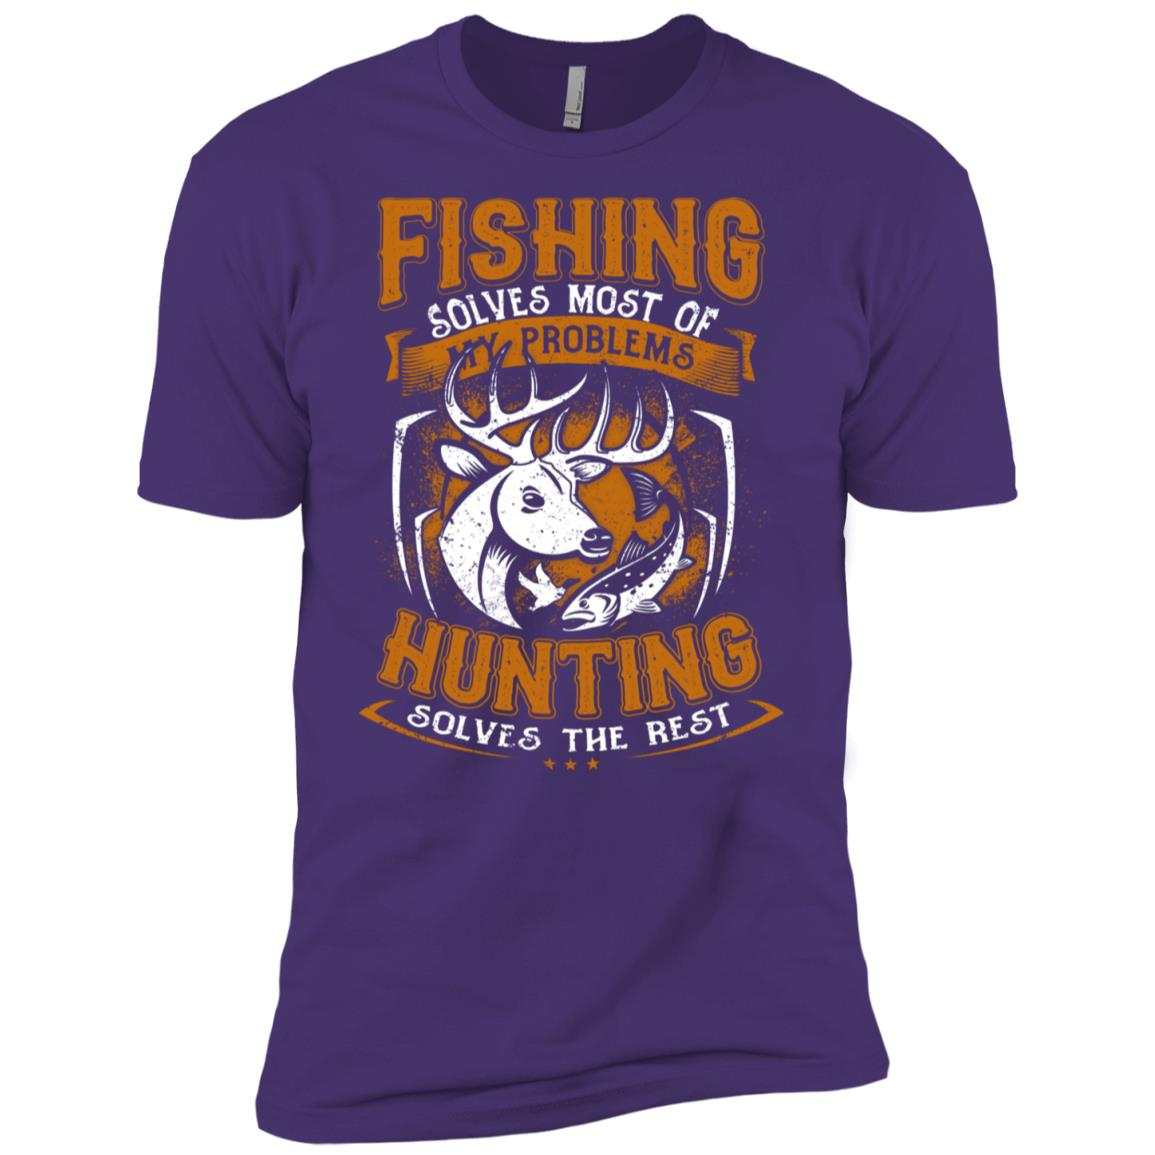 Funny Fishing Hunting Gift for Hunters Men Short Sleeve T-Shirt